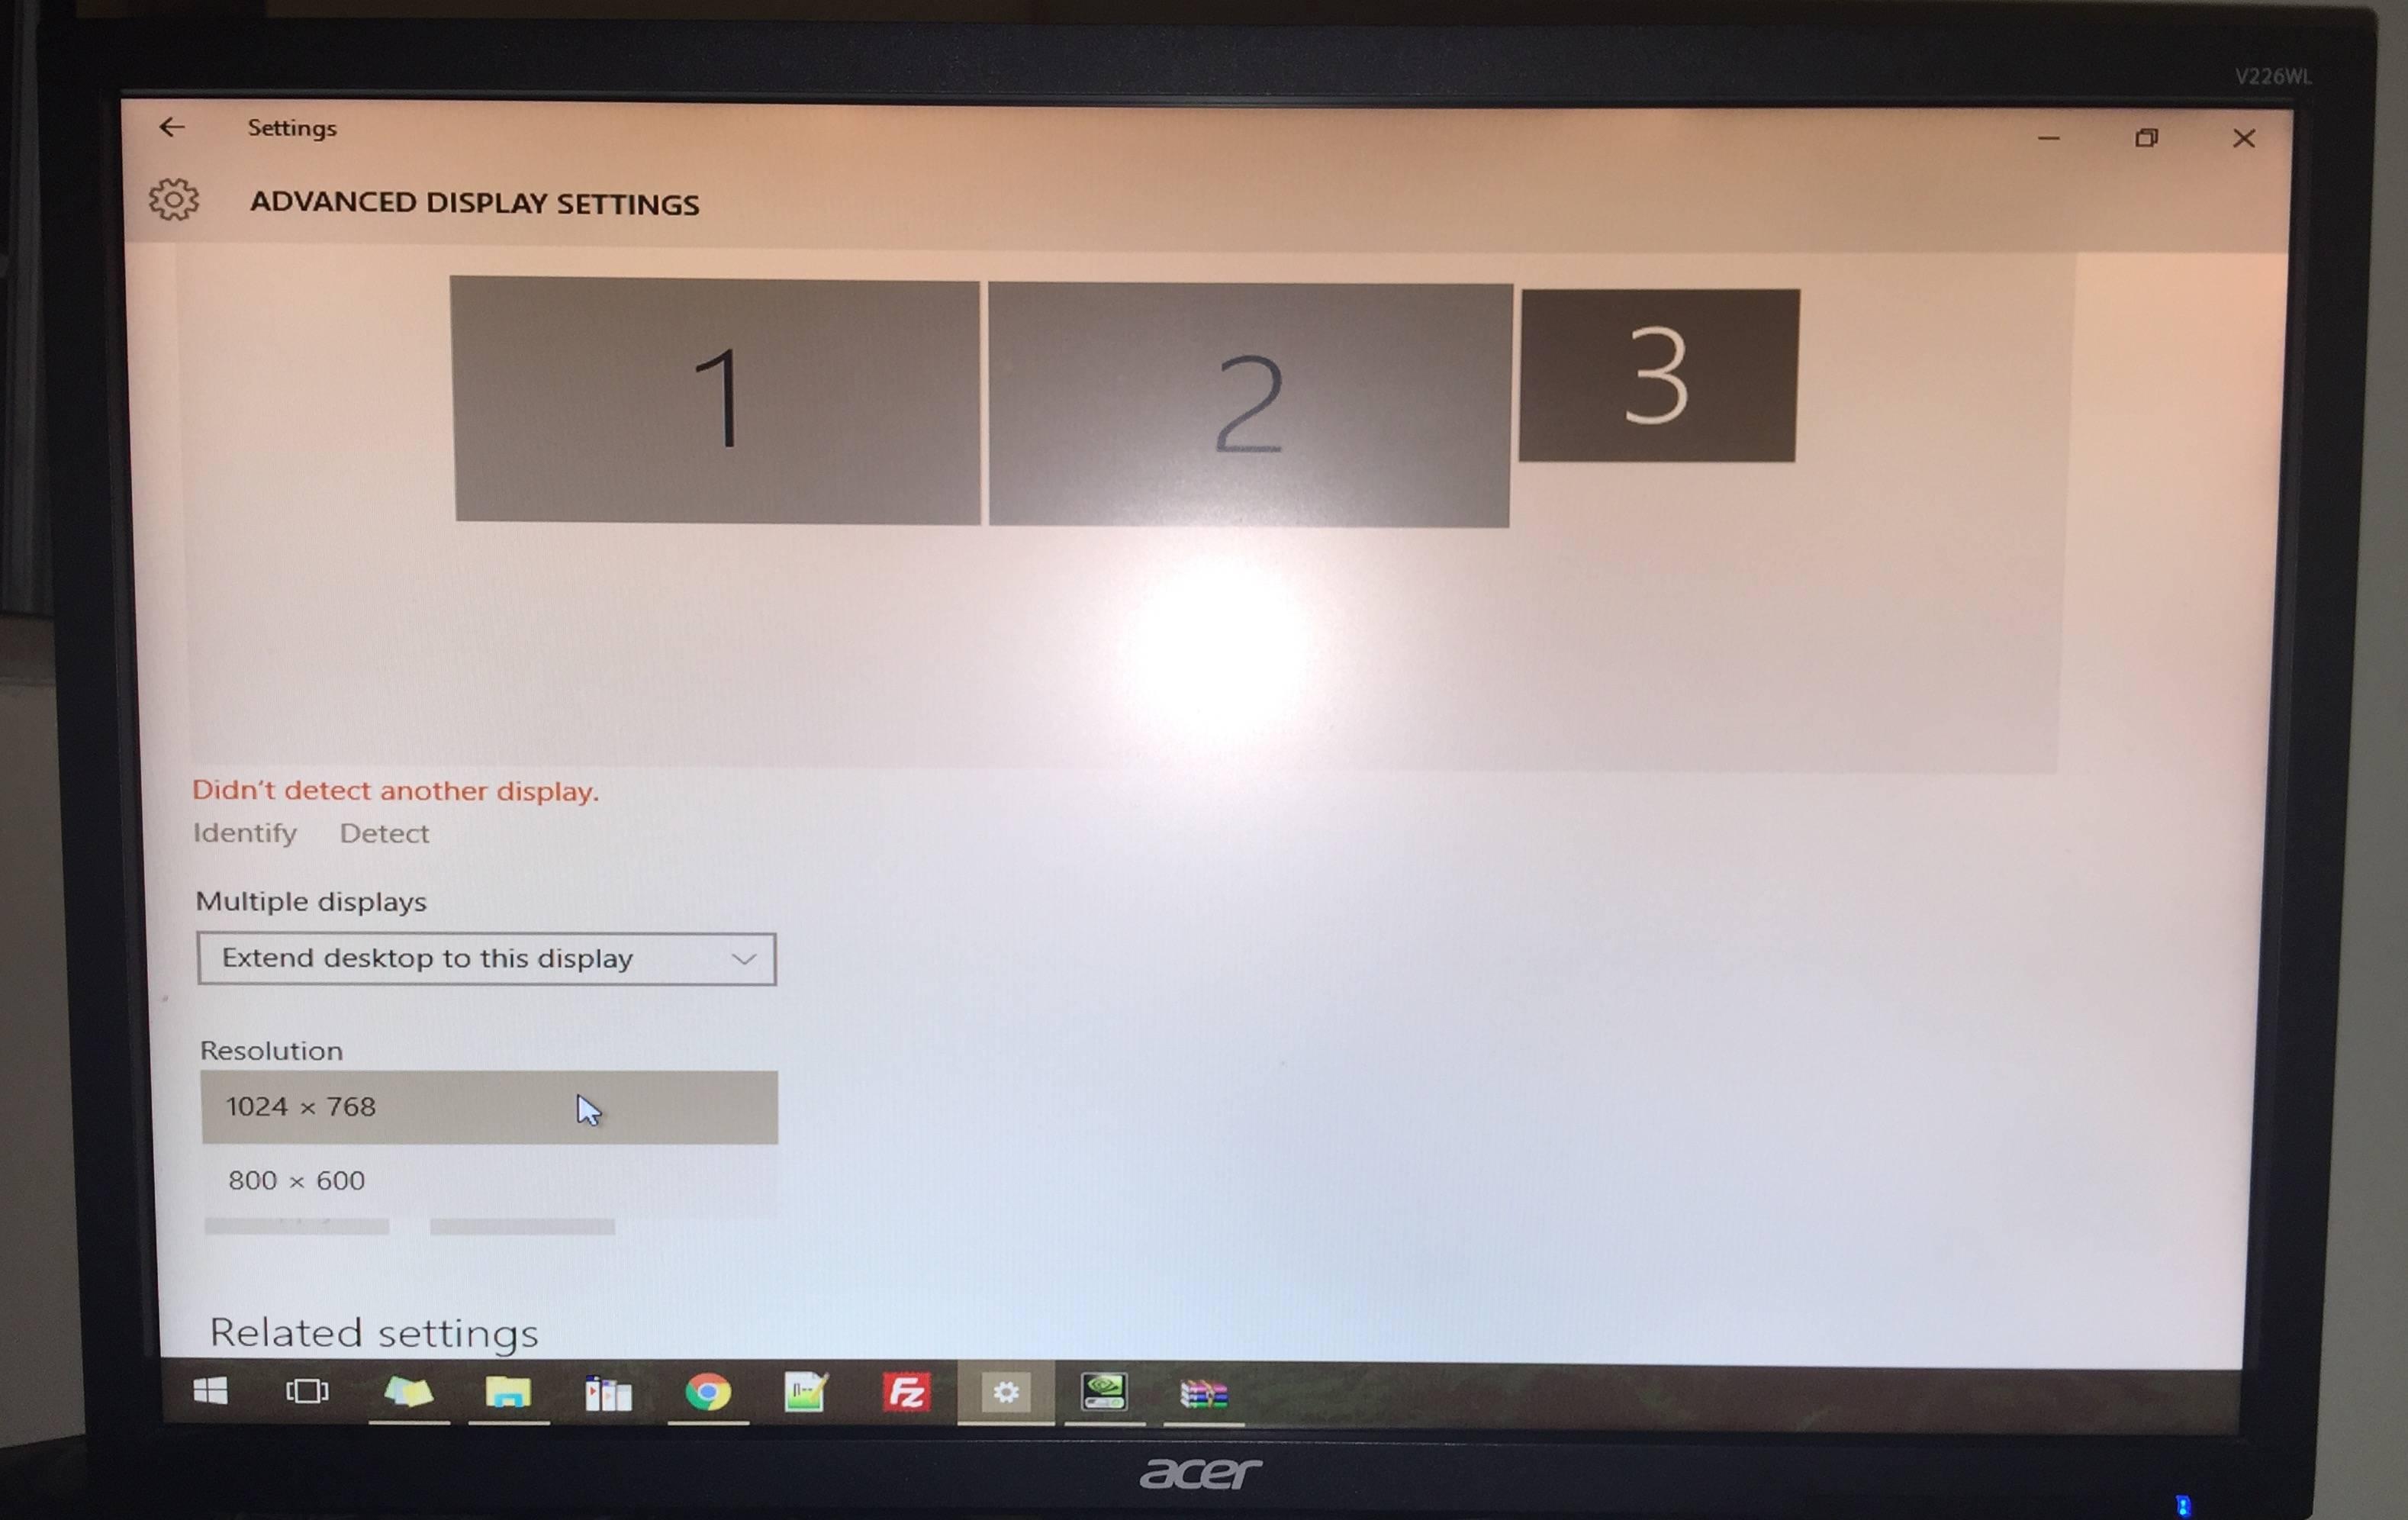 Dell Optiplex 7010 Drivers